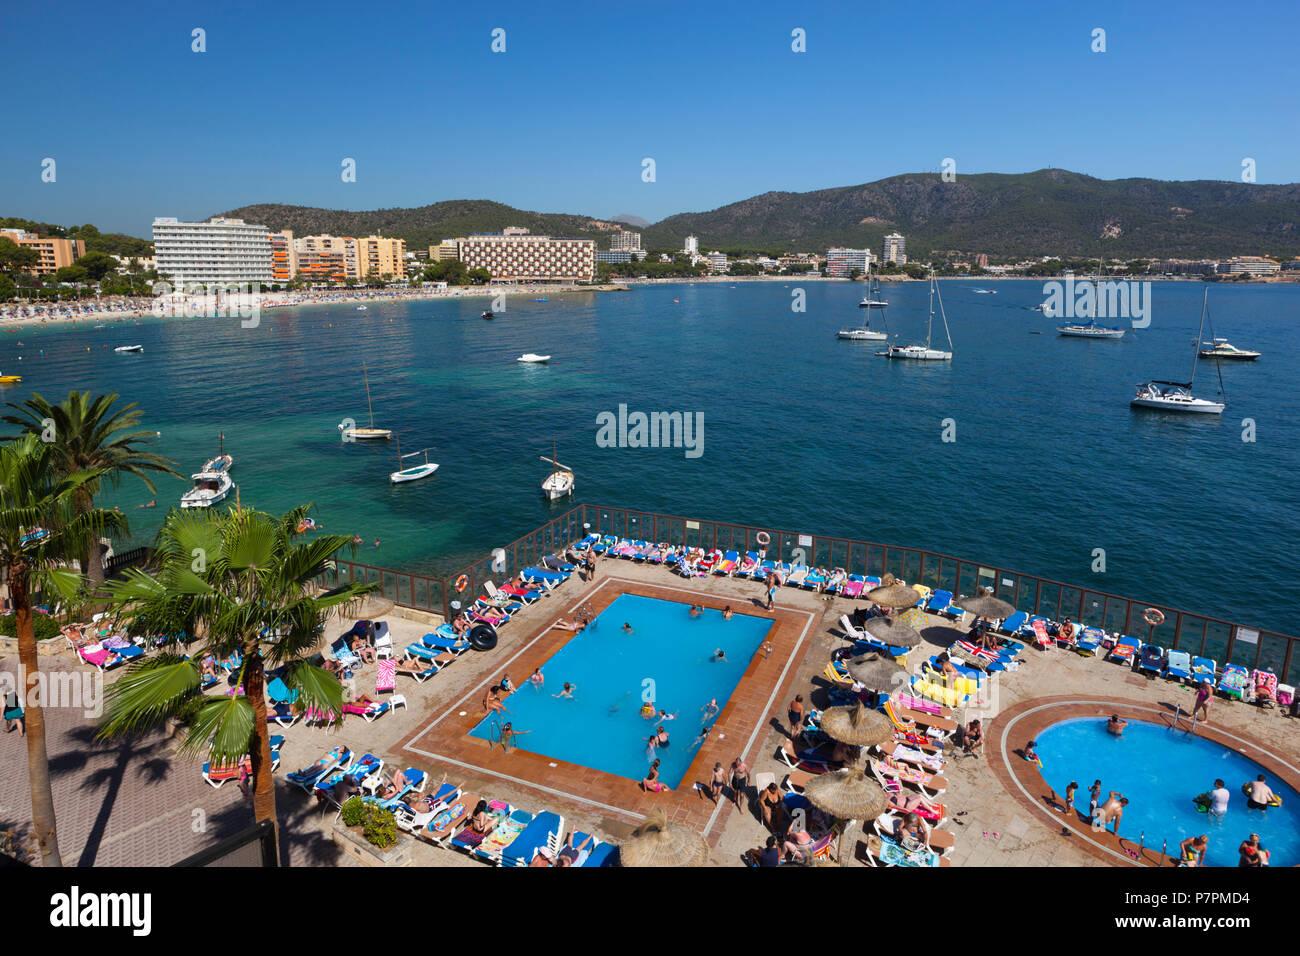 View of Palmanova resort in summer - Stock Image